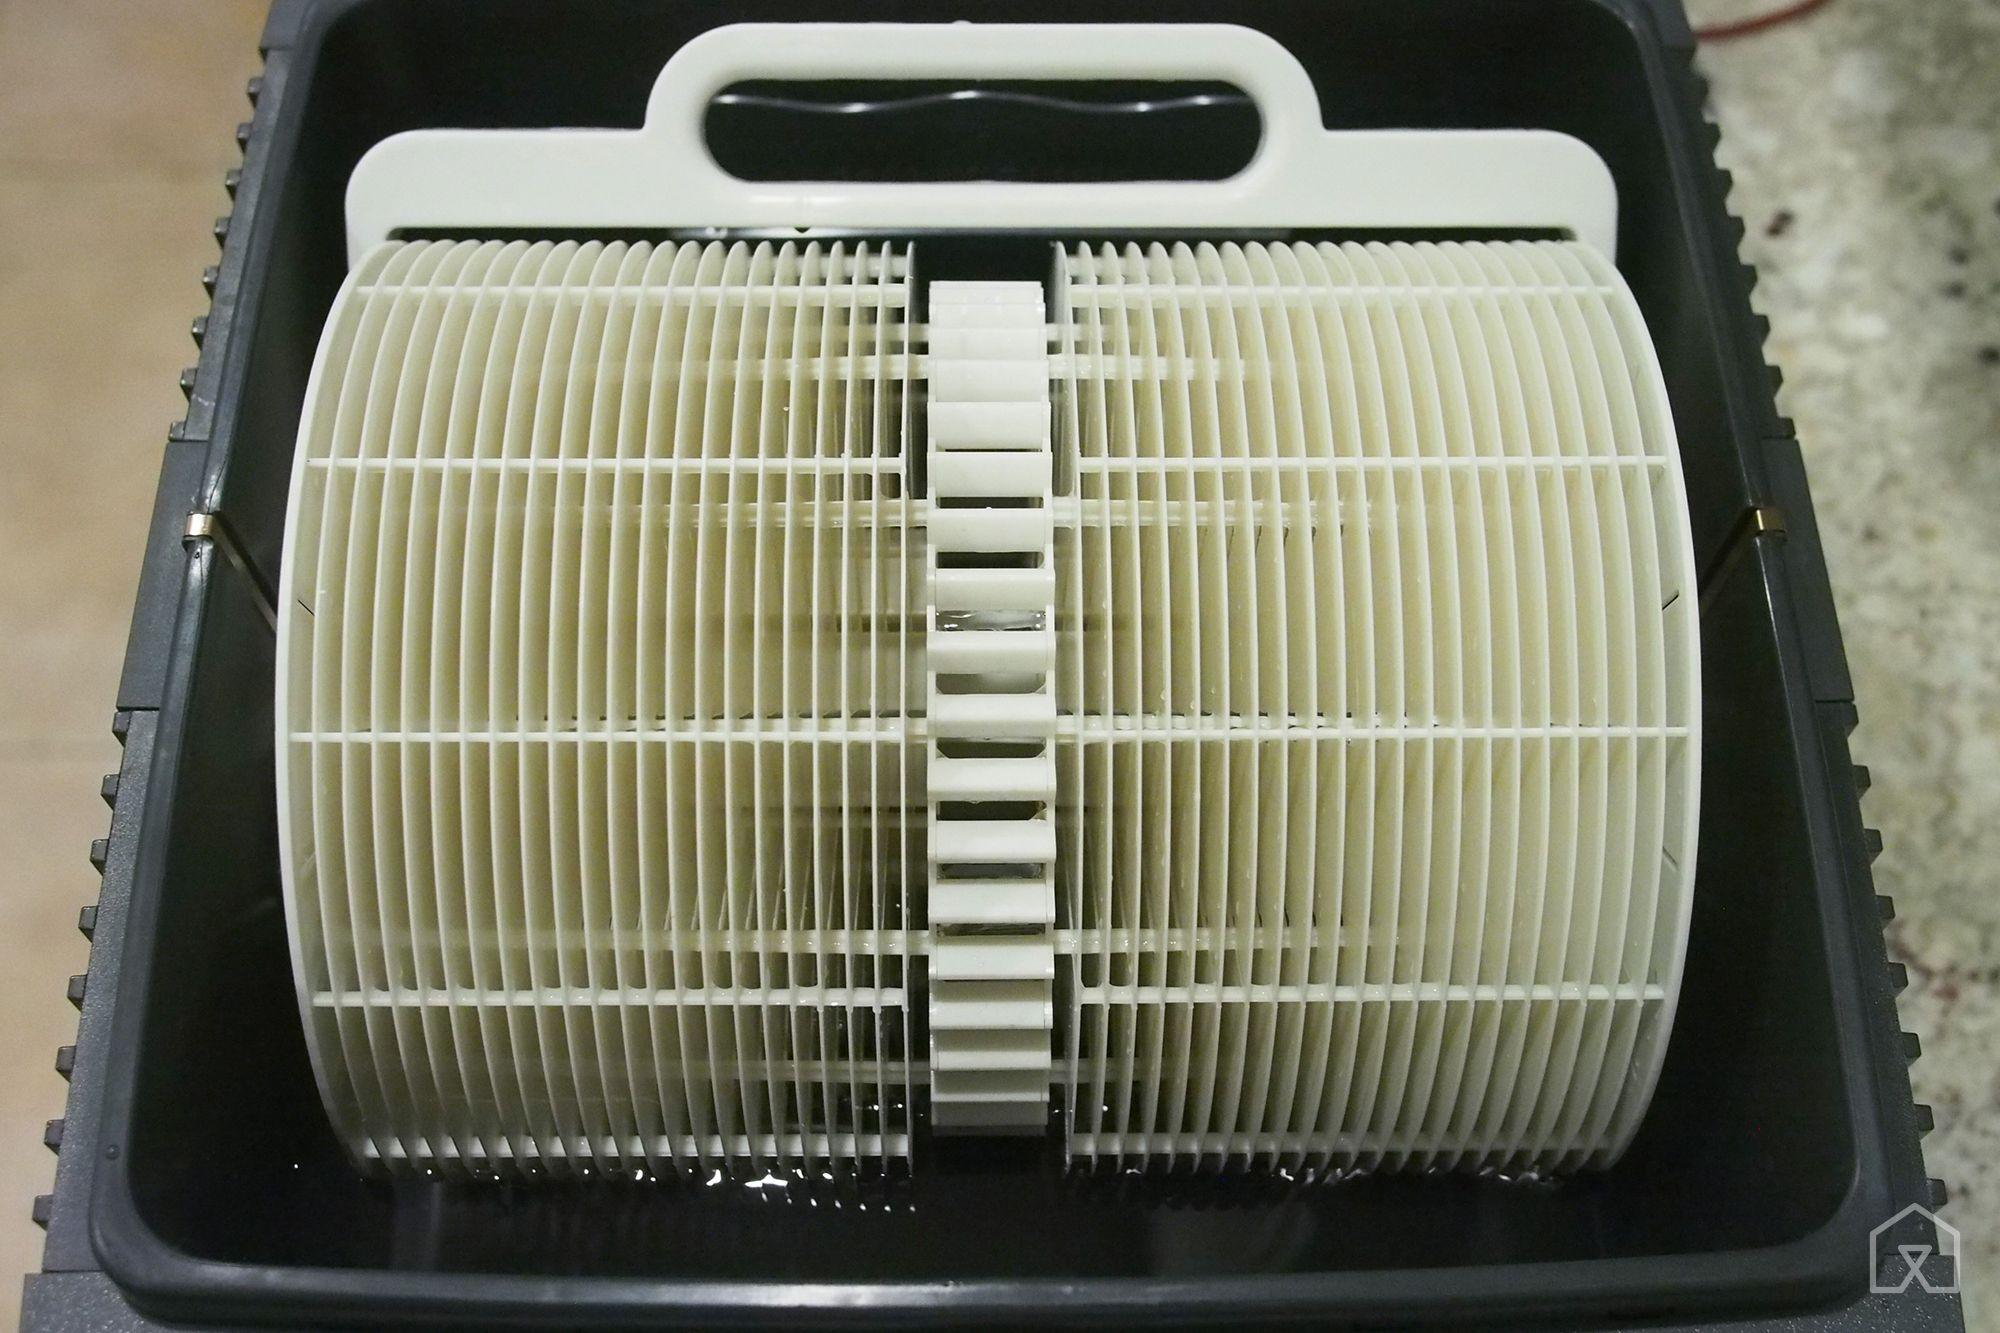 The best humidifier By John Holecek Tim Heffernan This